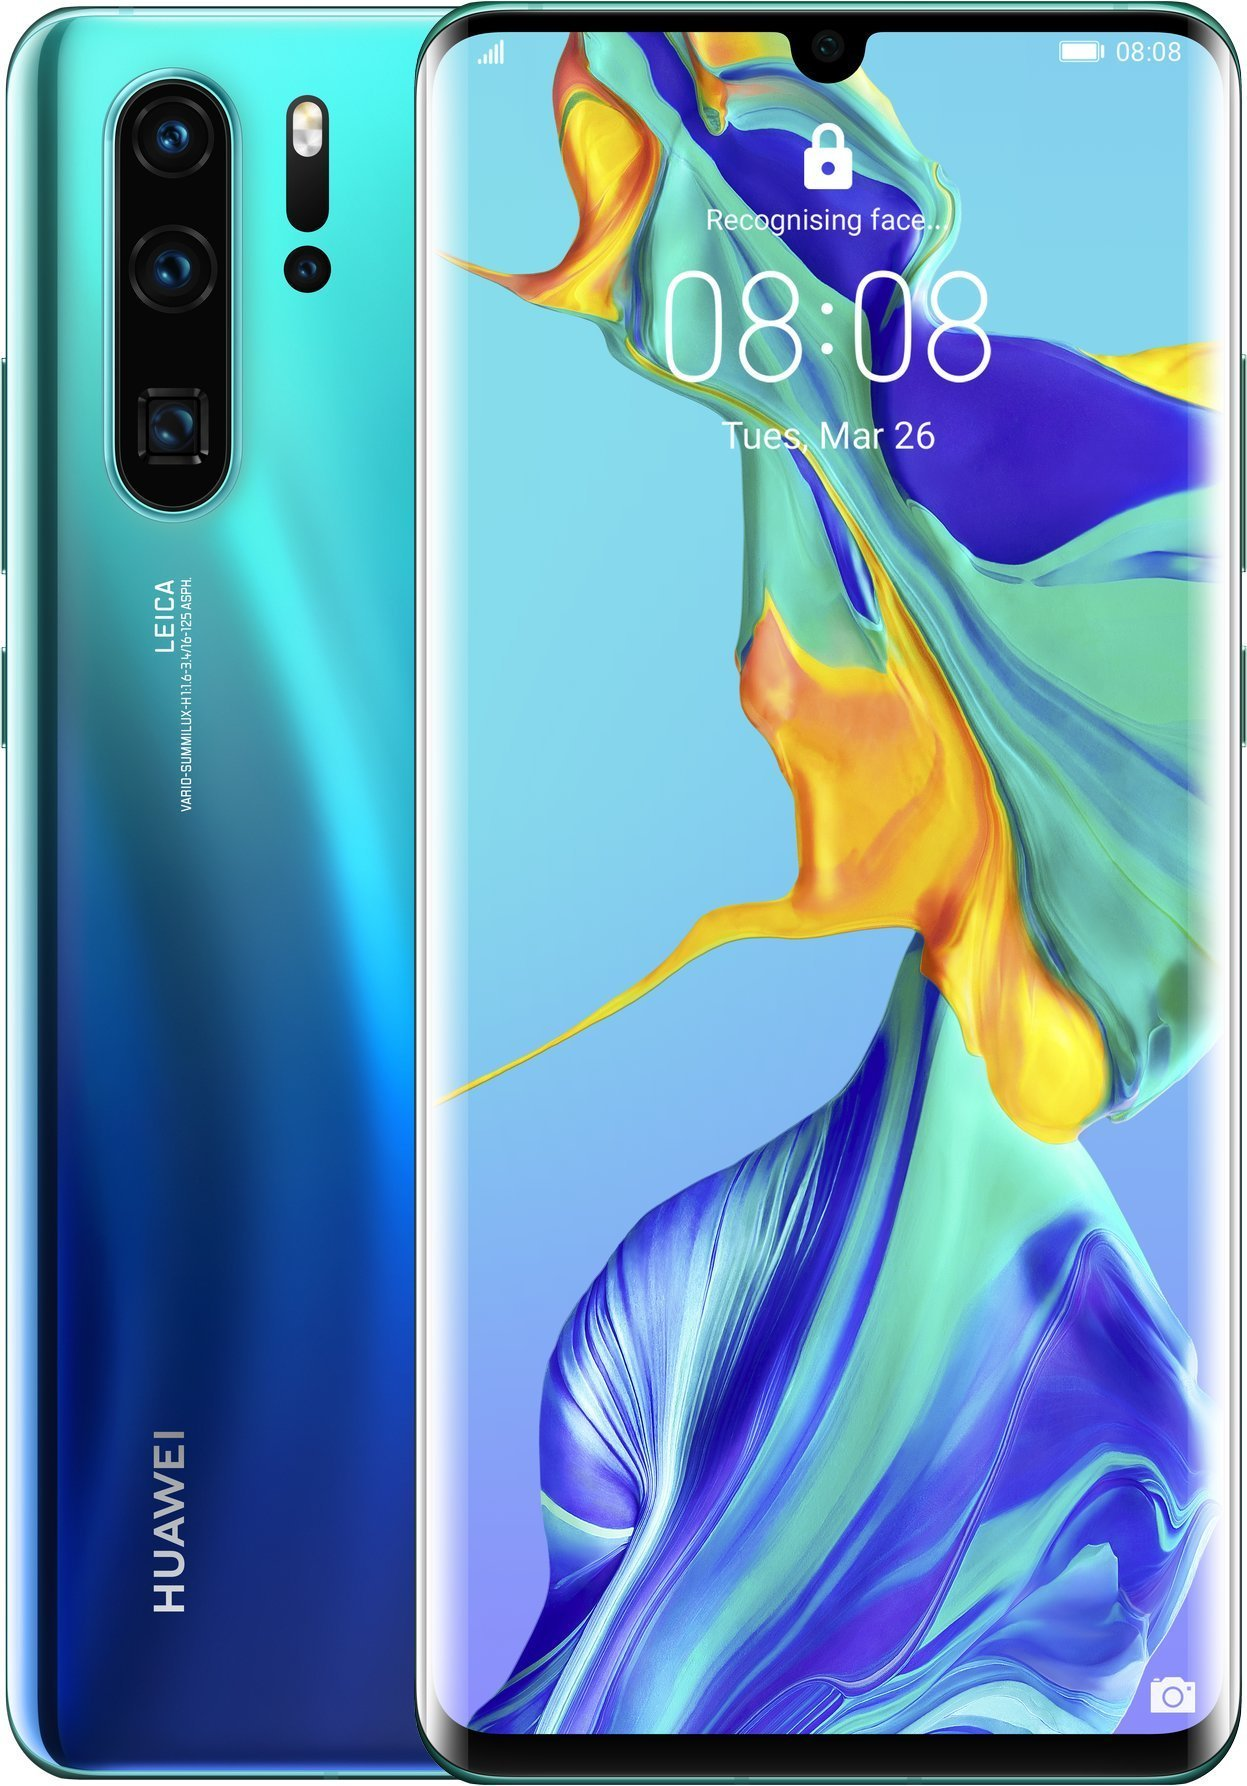 Huawei P30 PRO 128GB Dual Sim Aurora